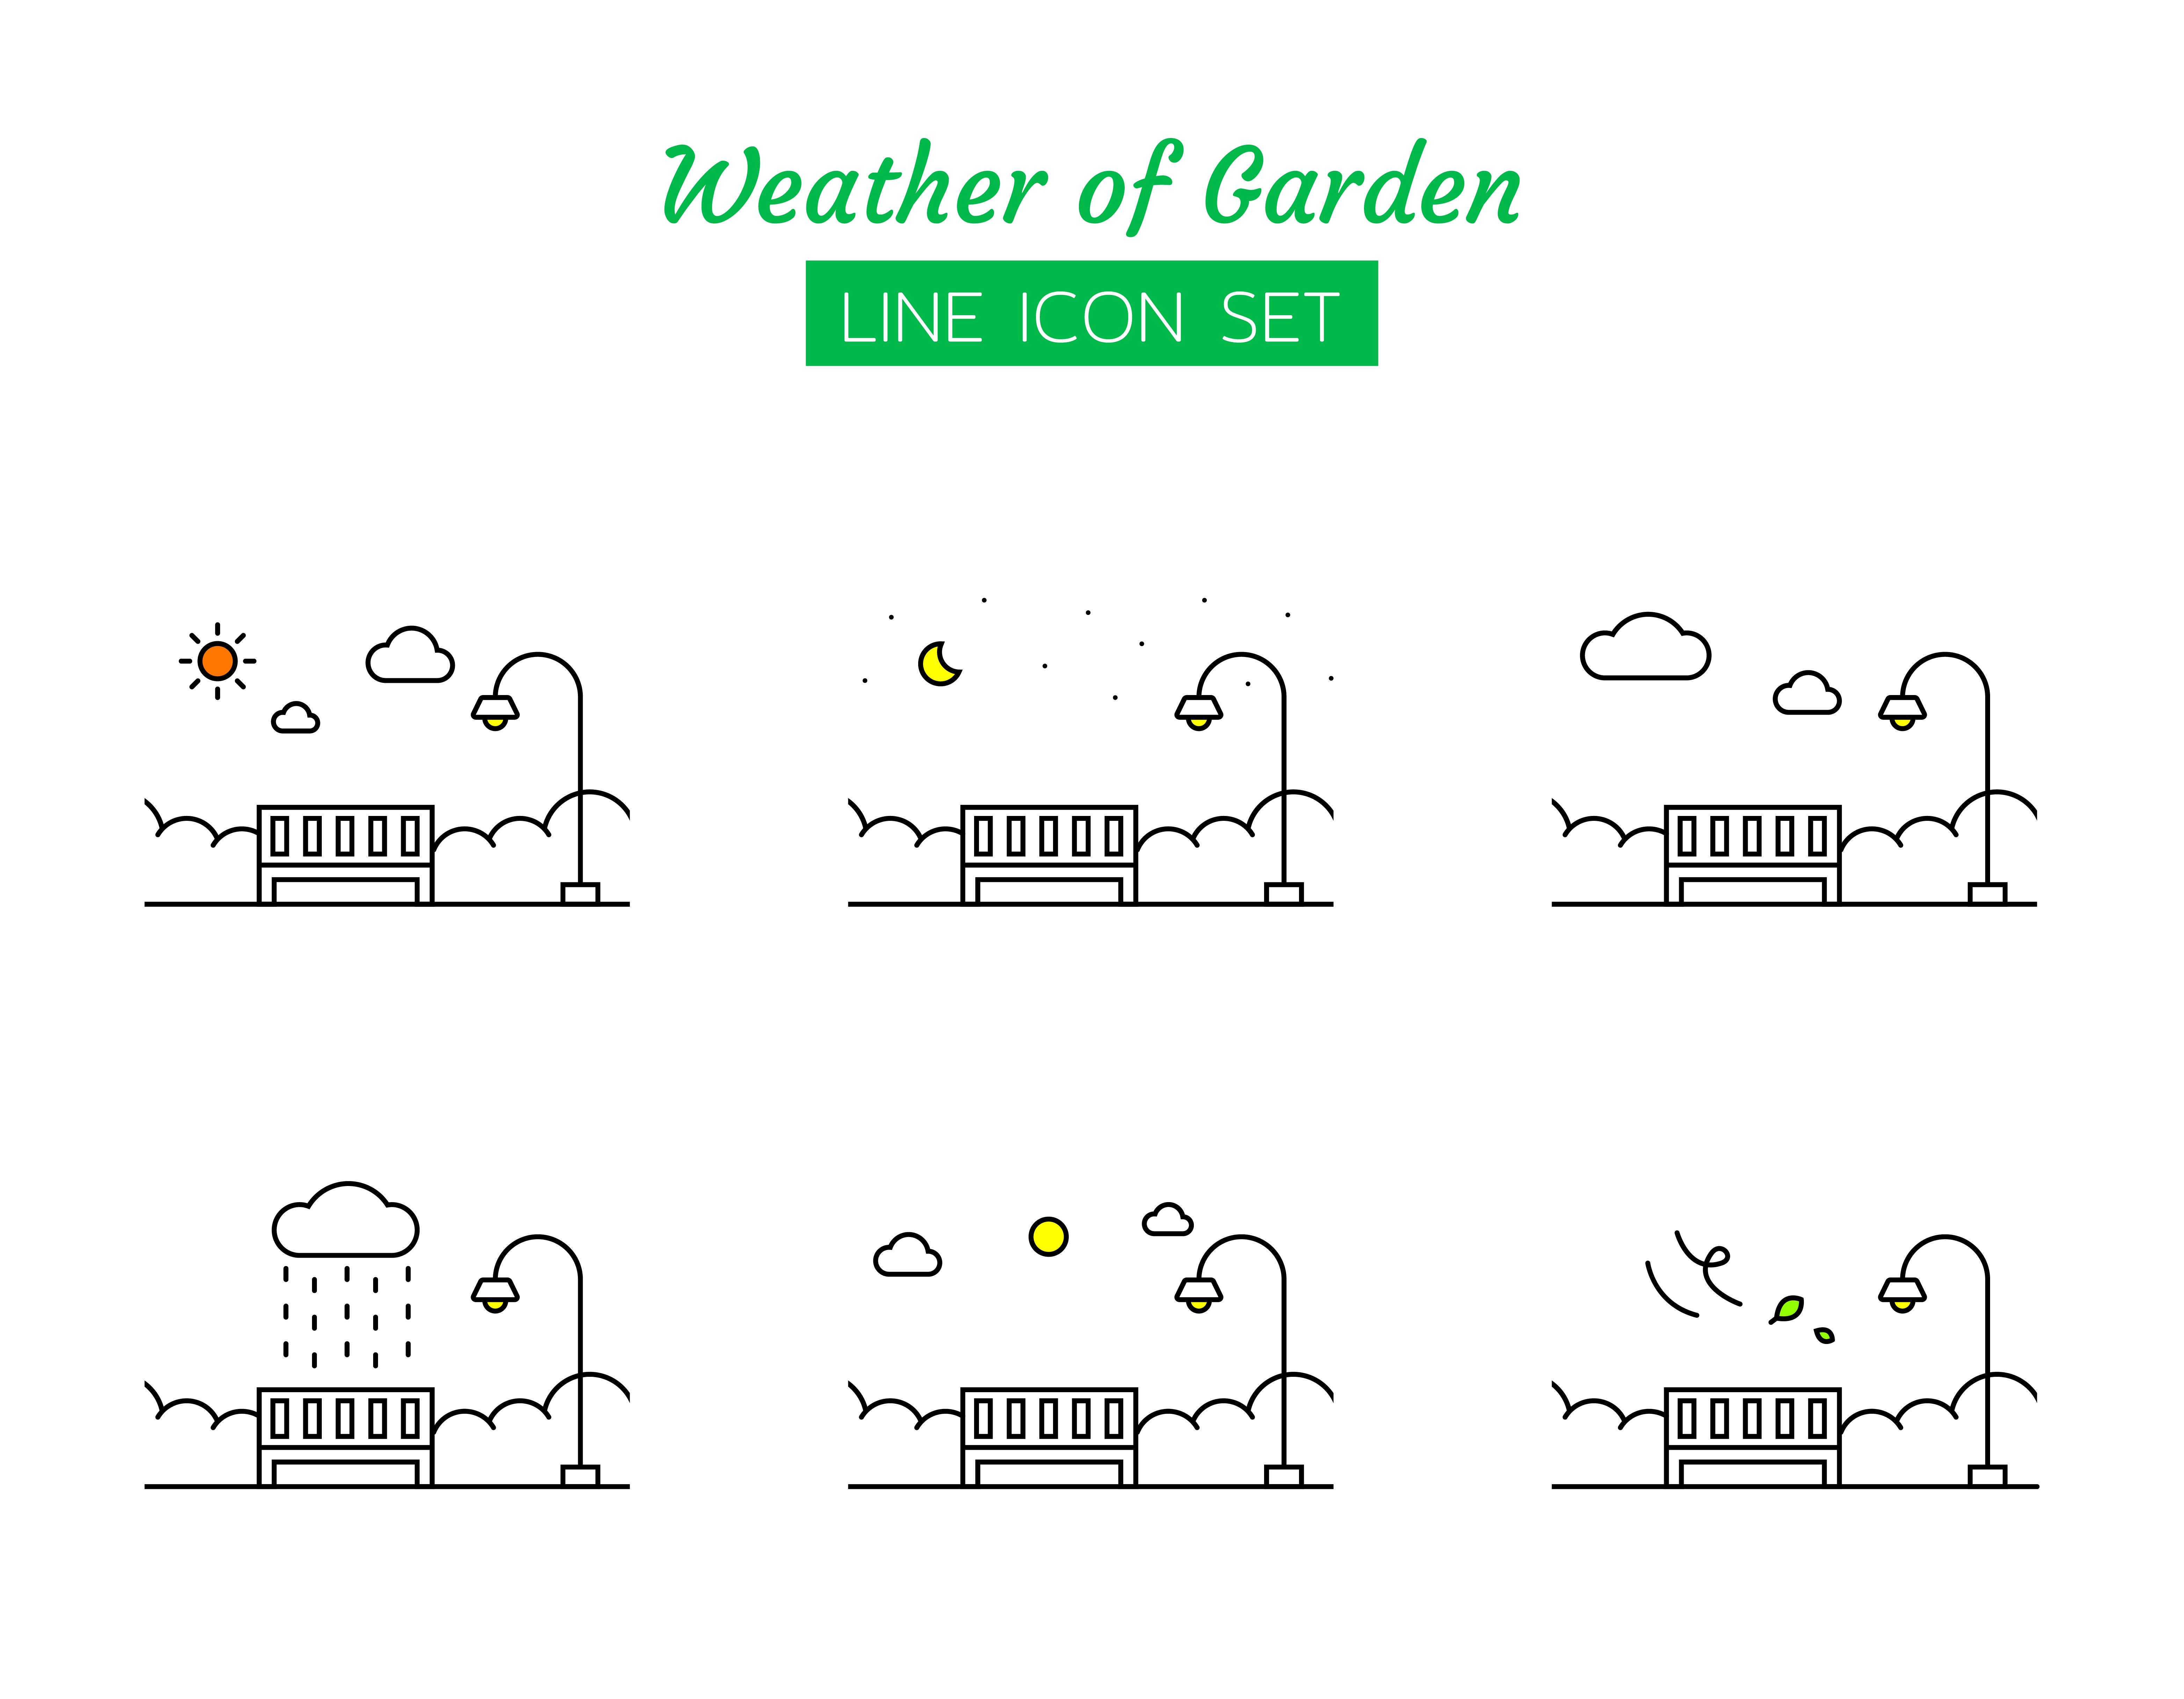 Garden weather line icon symbol set